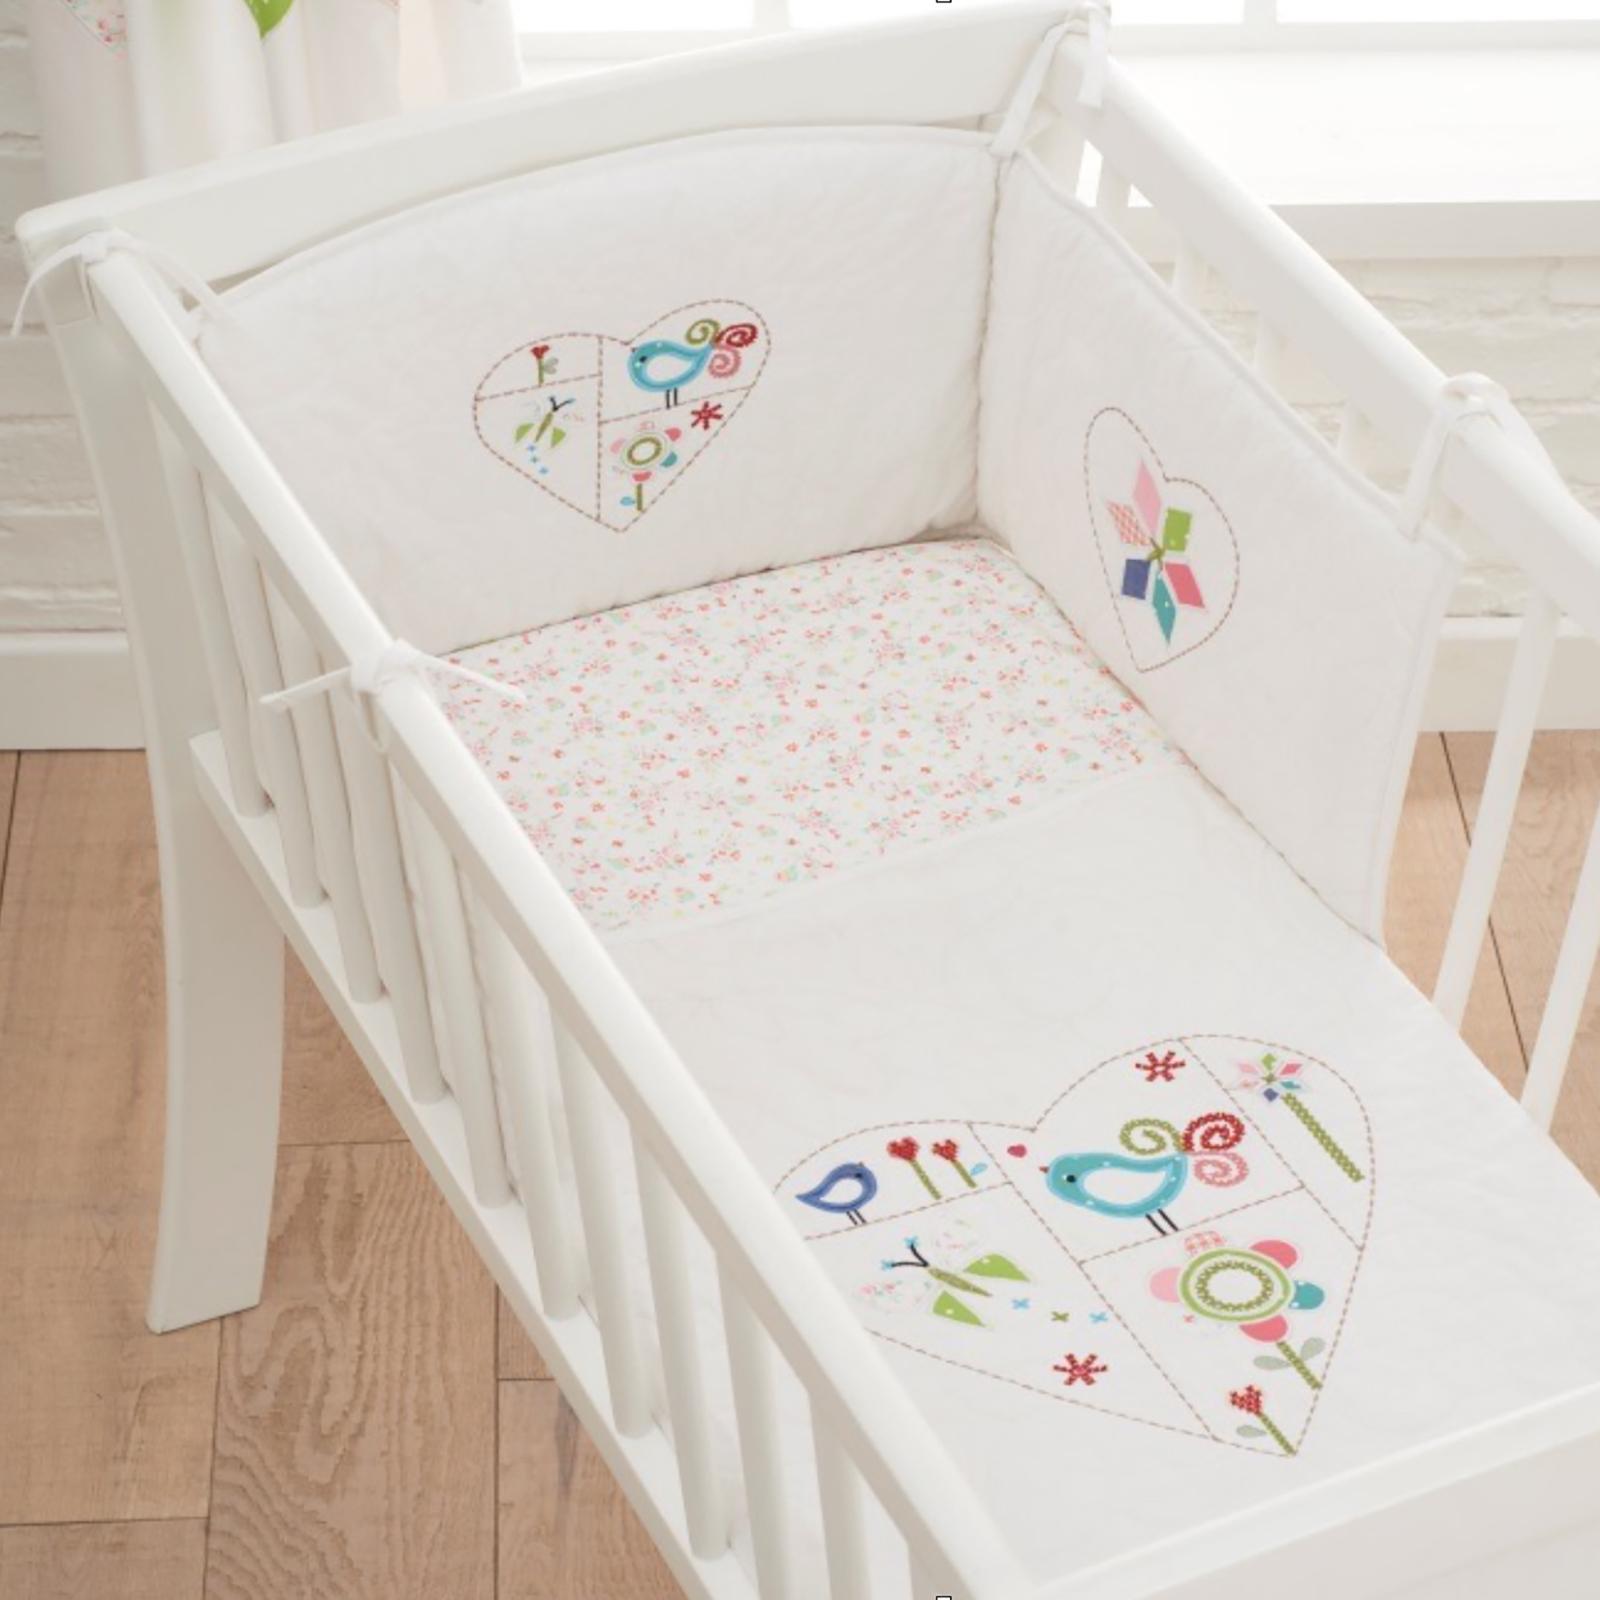 4baby Designer 3 Piece Crib Bedding Set Doodles Buy At Online4baby